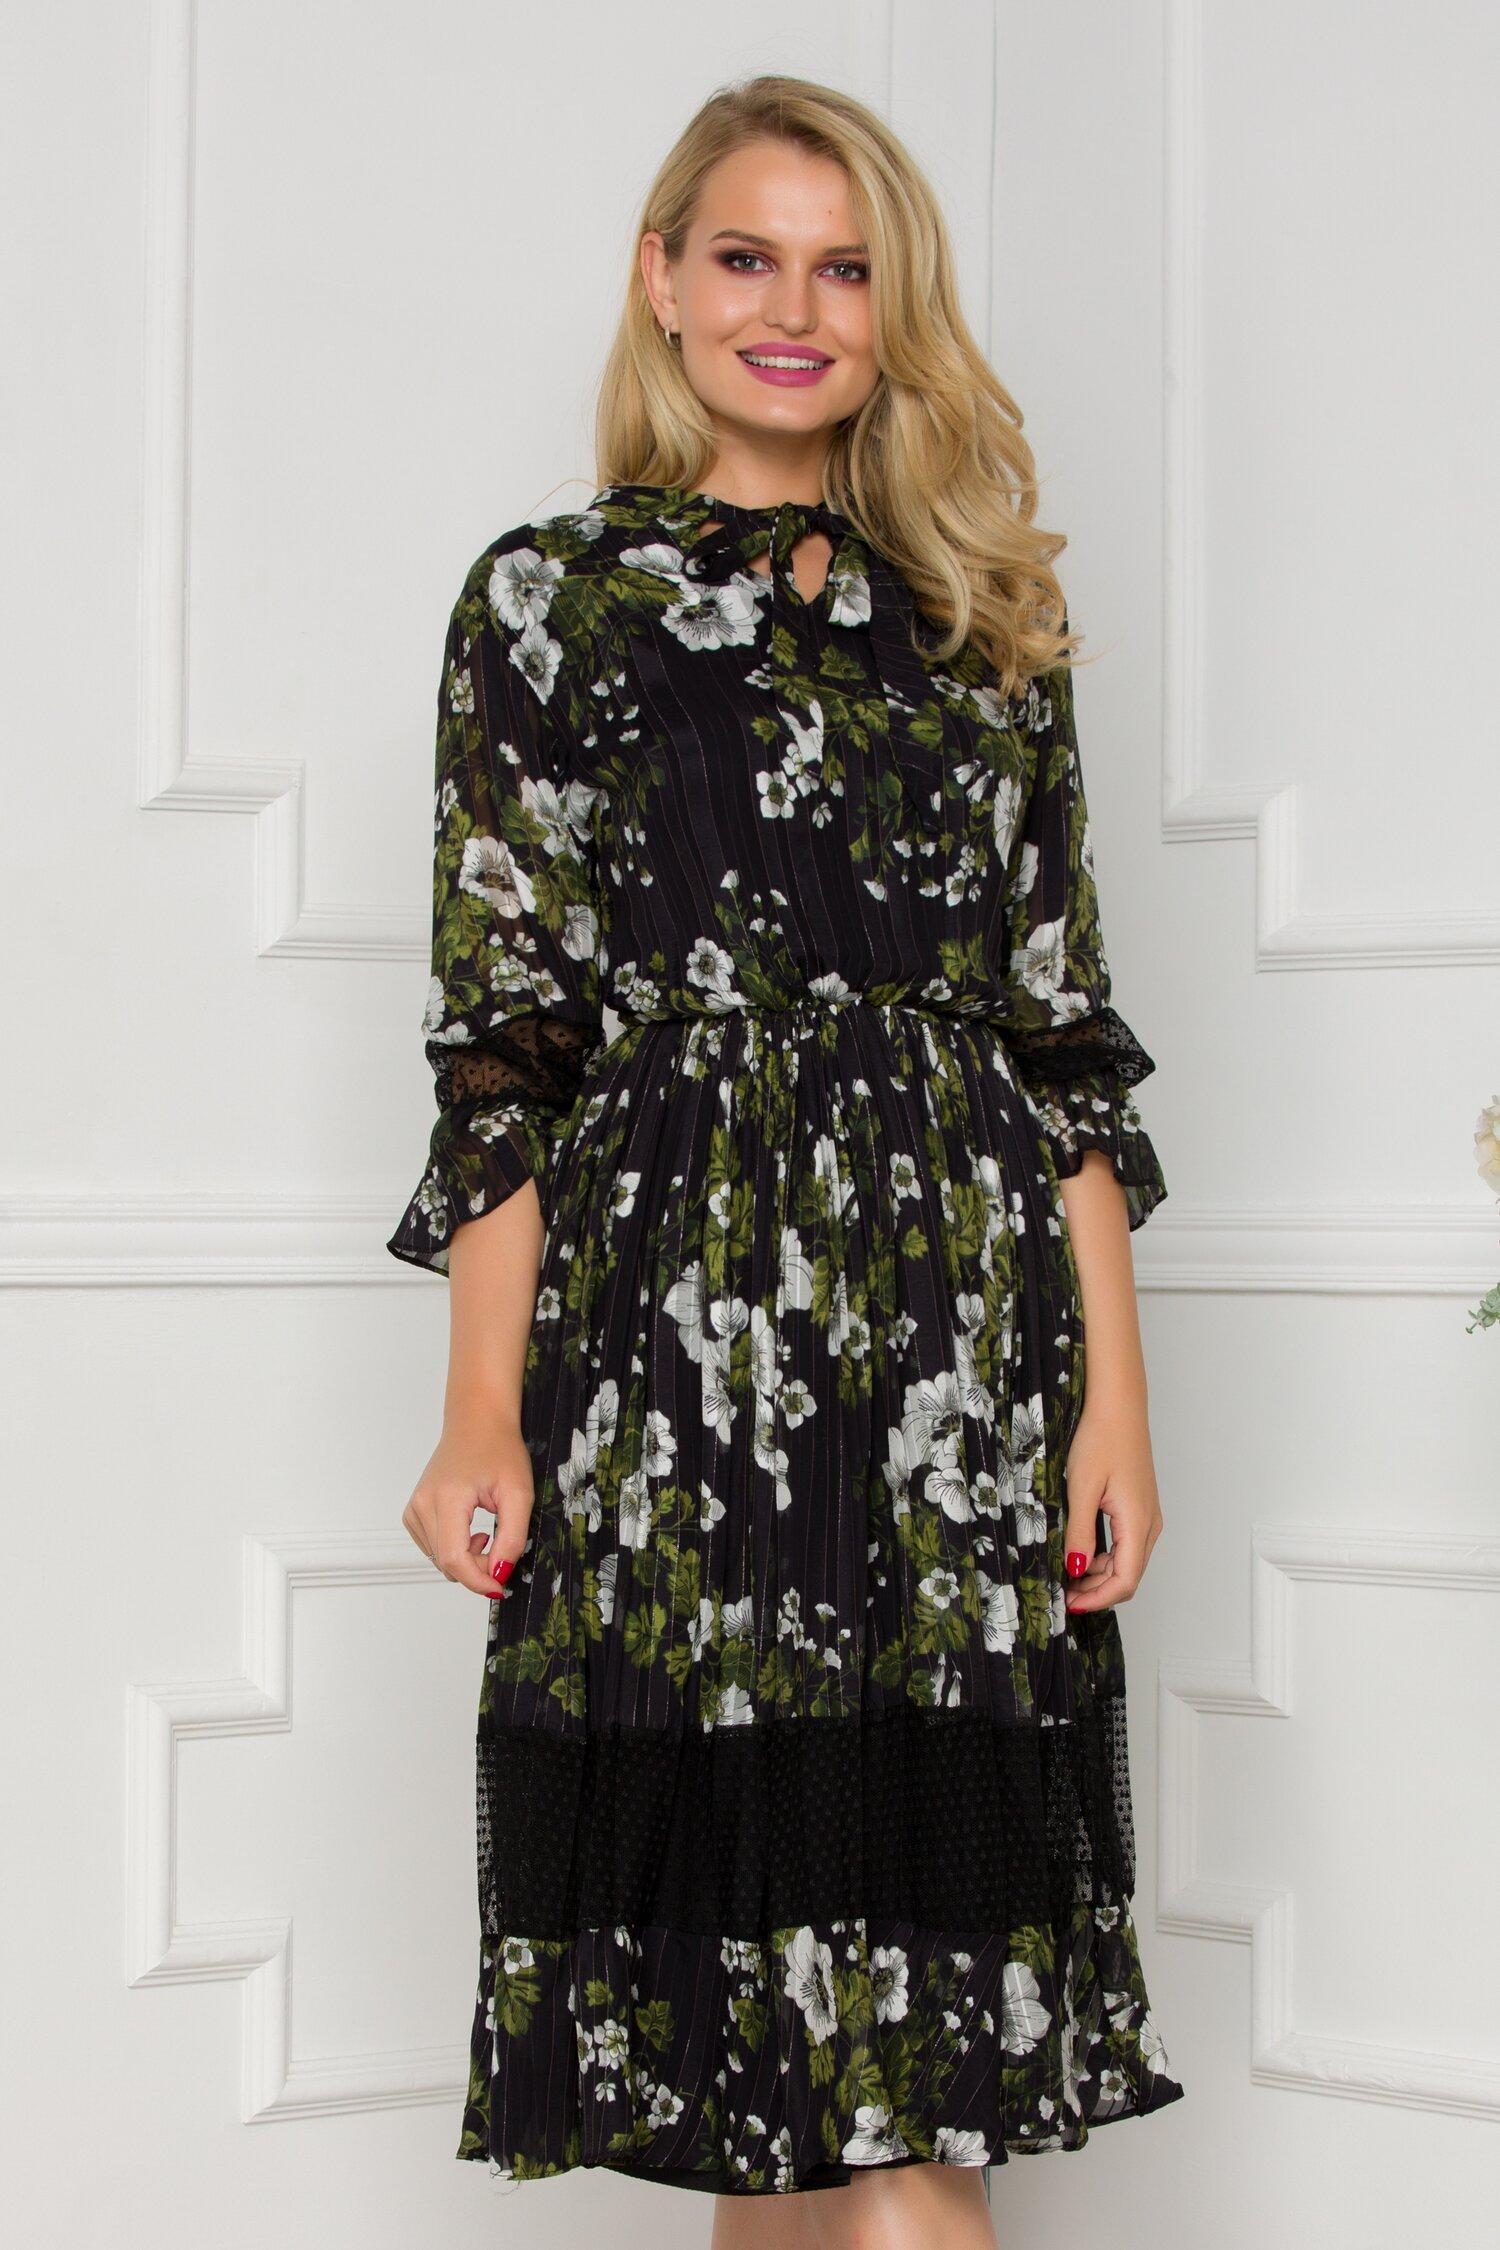 Rochie Gia neagra cu dungi si imprimeu floral in nuante de kaki imagine